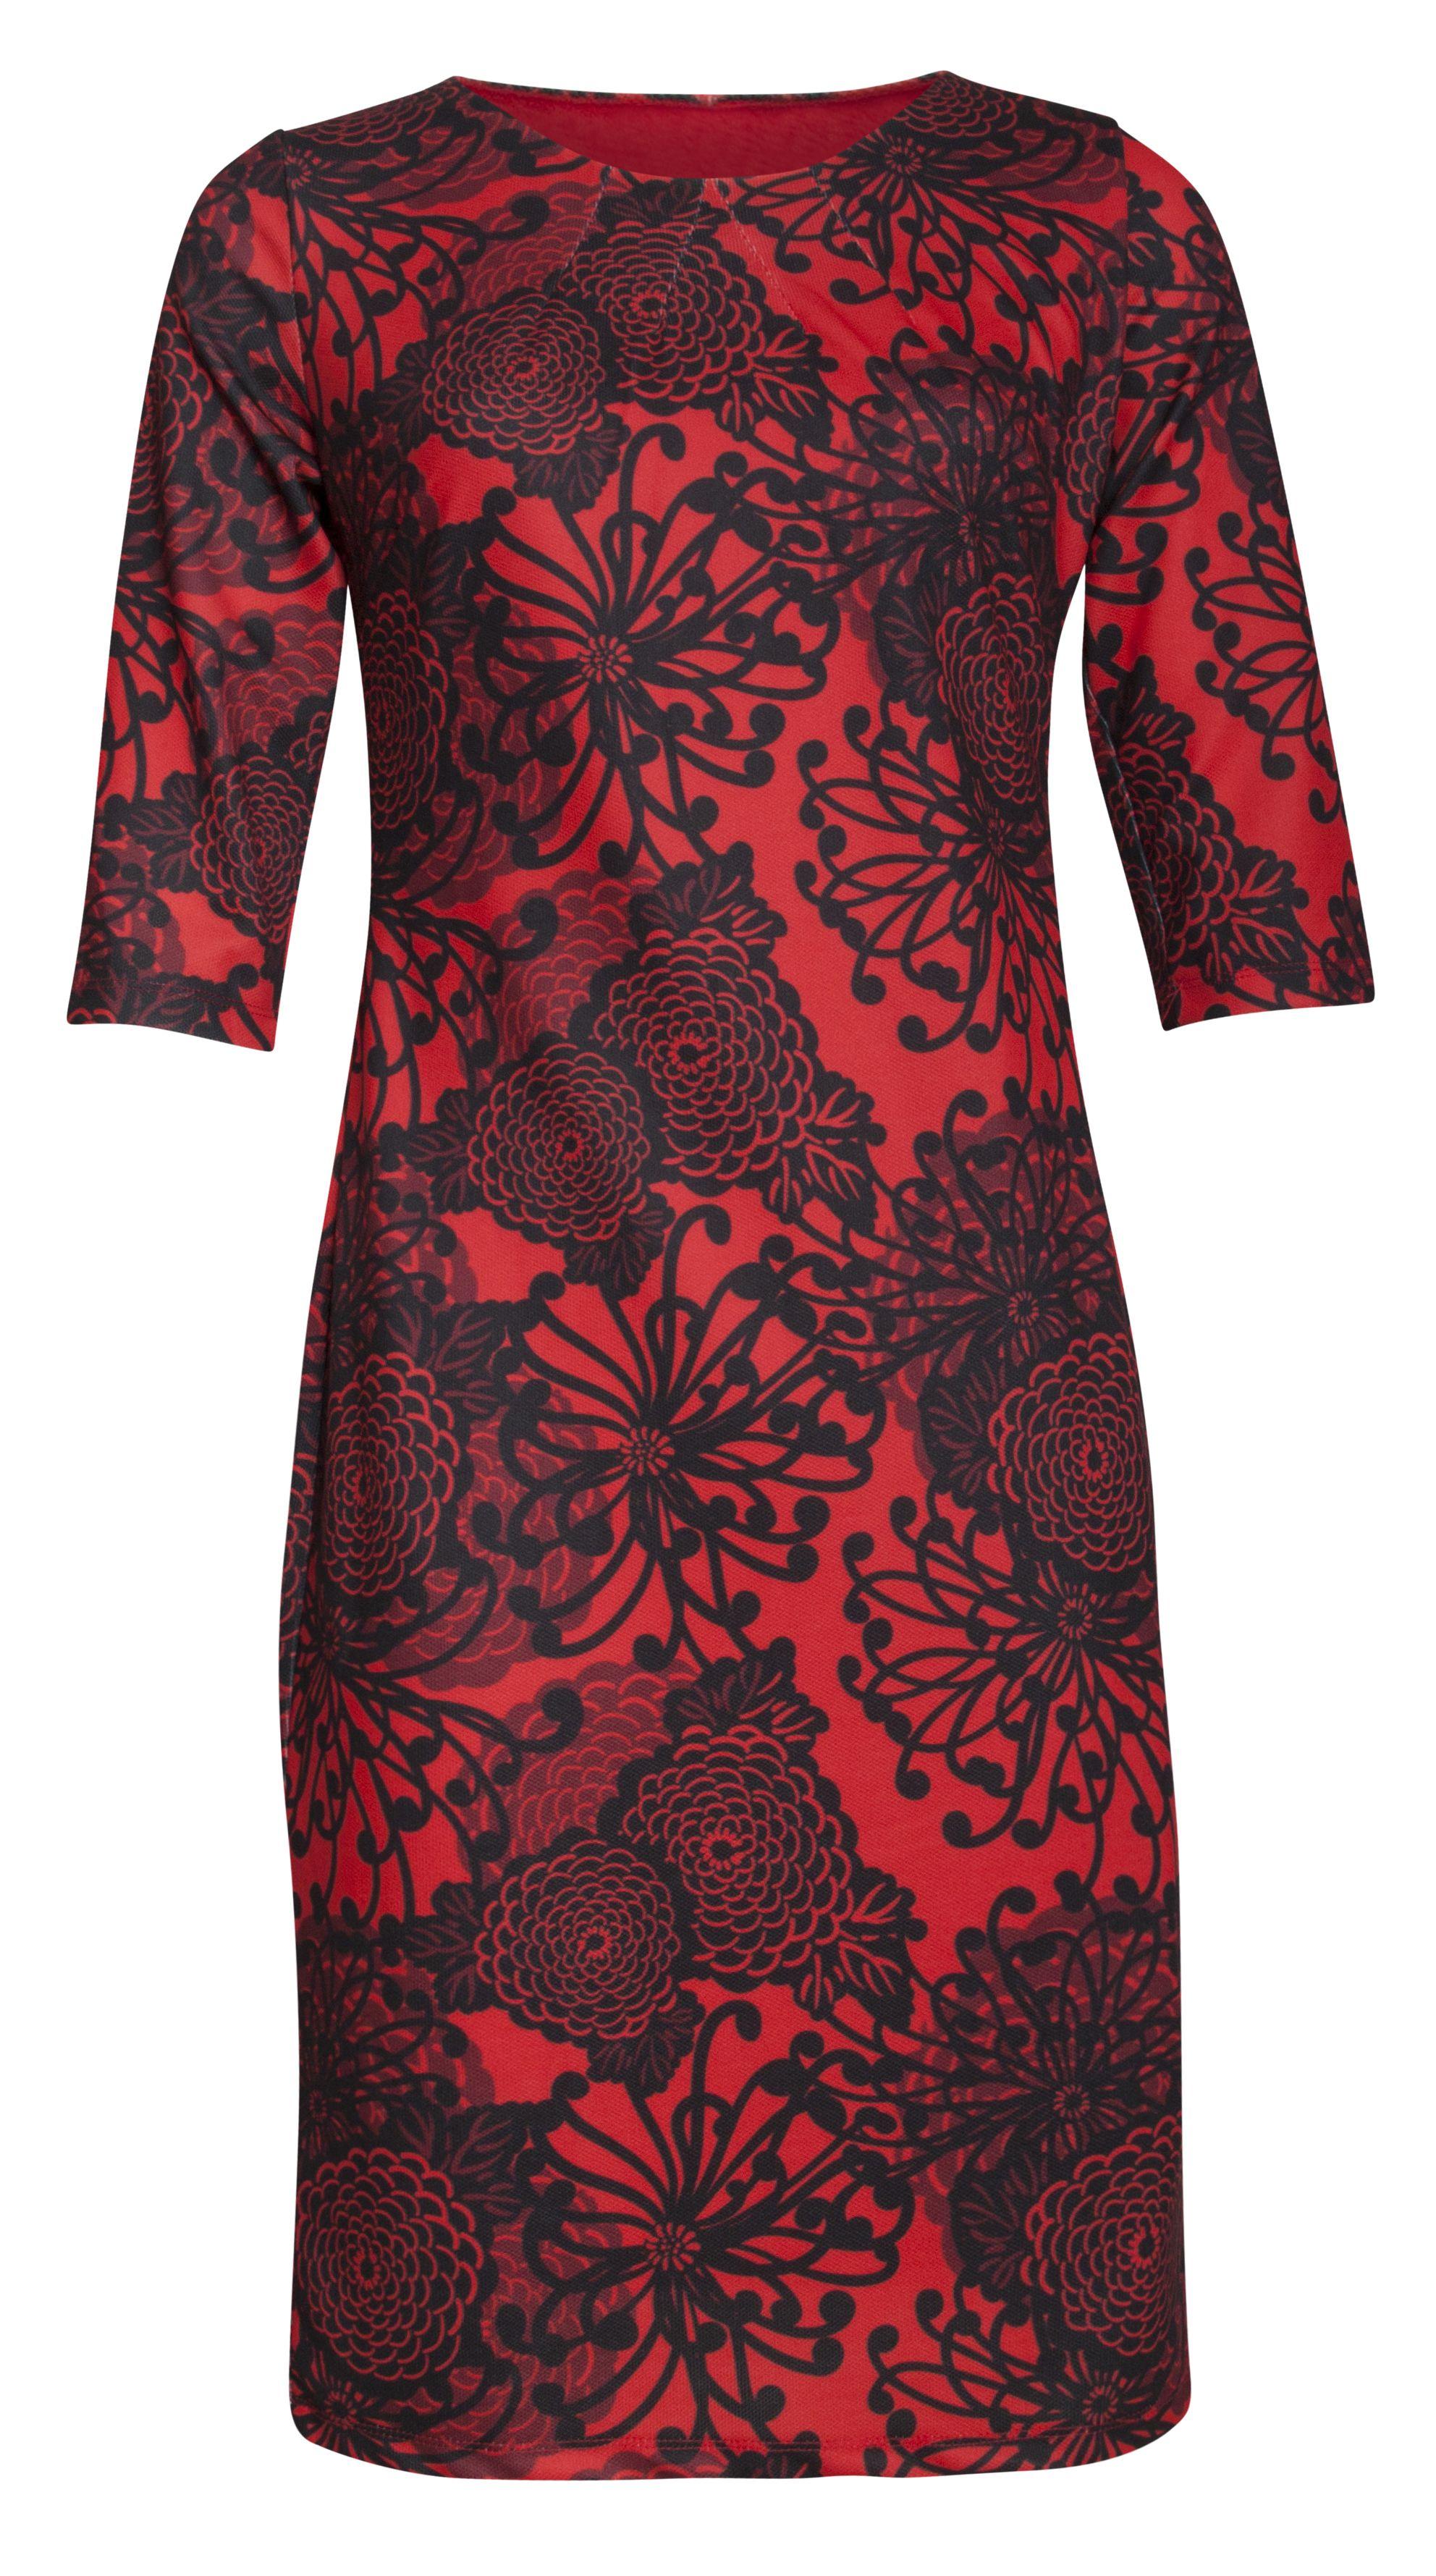 Mooie Rode Jurk.Mooie Rode Jurk Met Zwarte Bloemenprint Van Het Merk Smashed Lemon